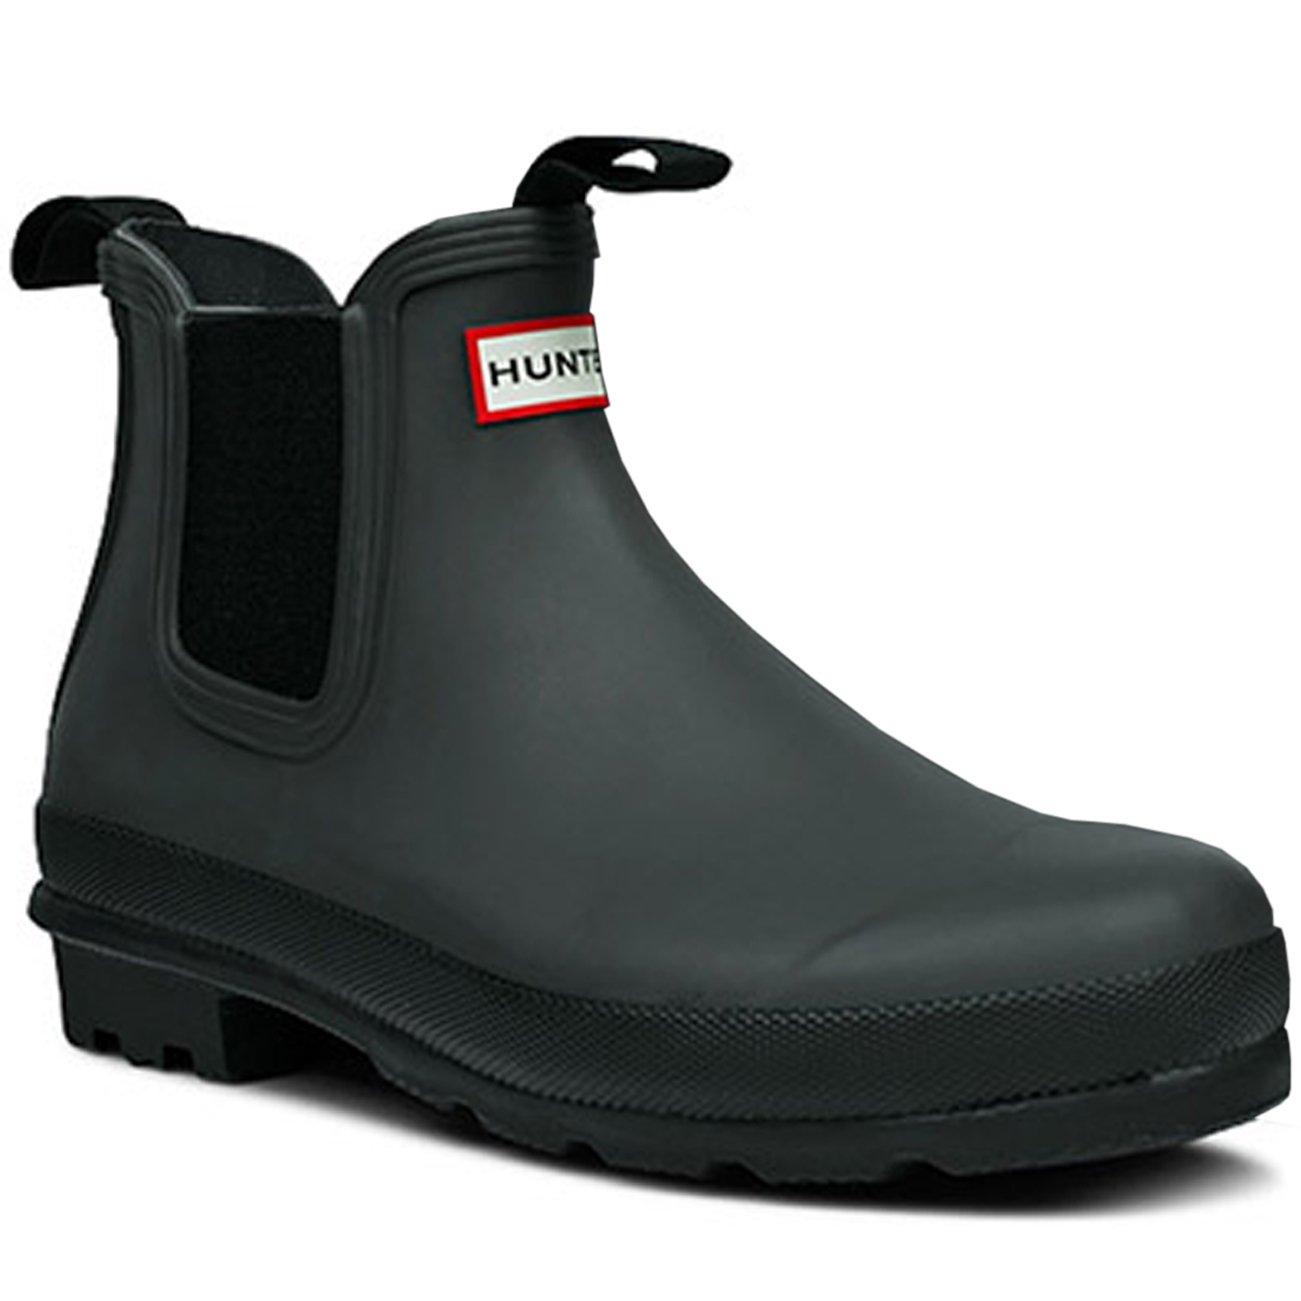 Womens Hunter Original Chelsea Wellingtons Waterproof Rain Ankle Boots B00NGPOUDO 9 B(M) US|Black